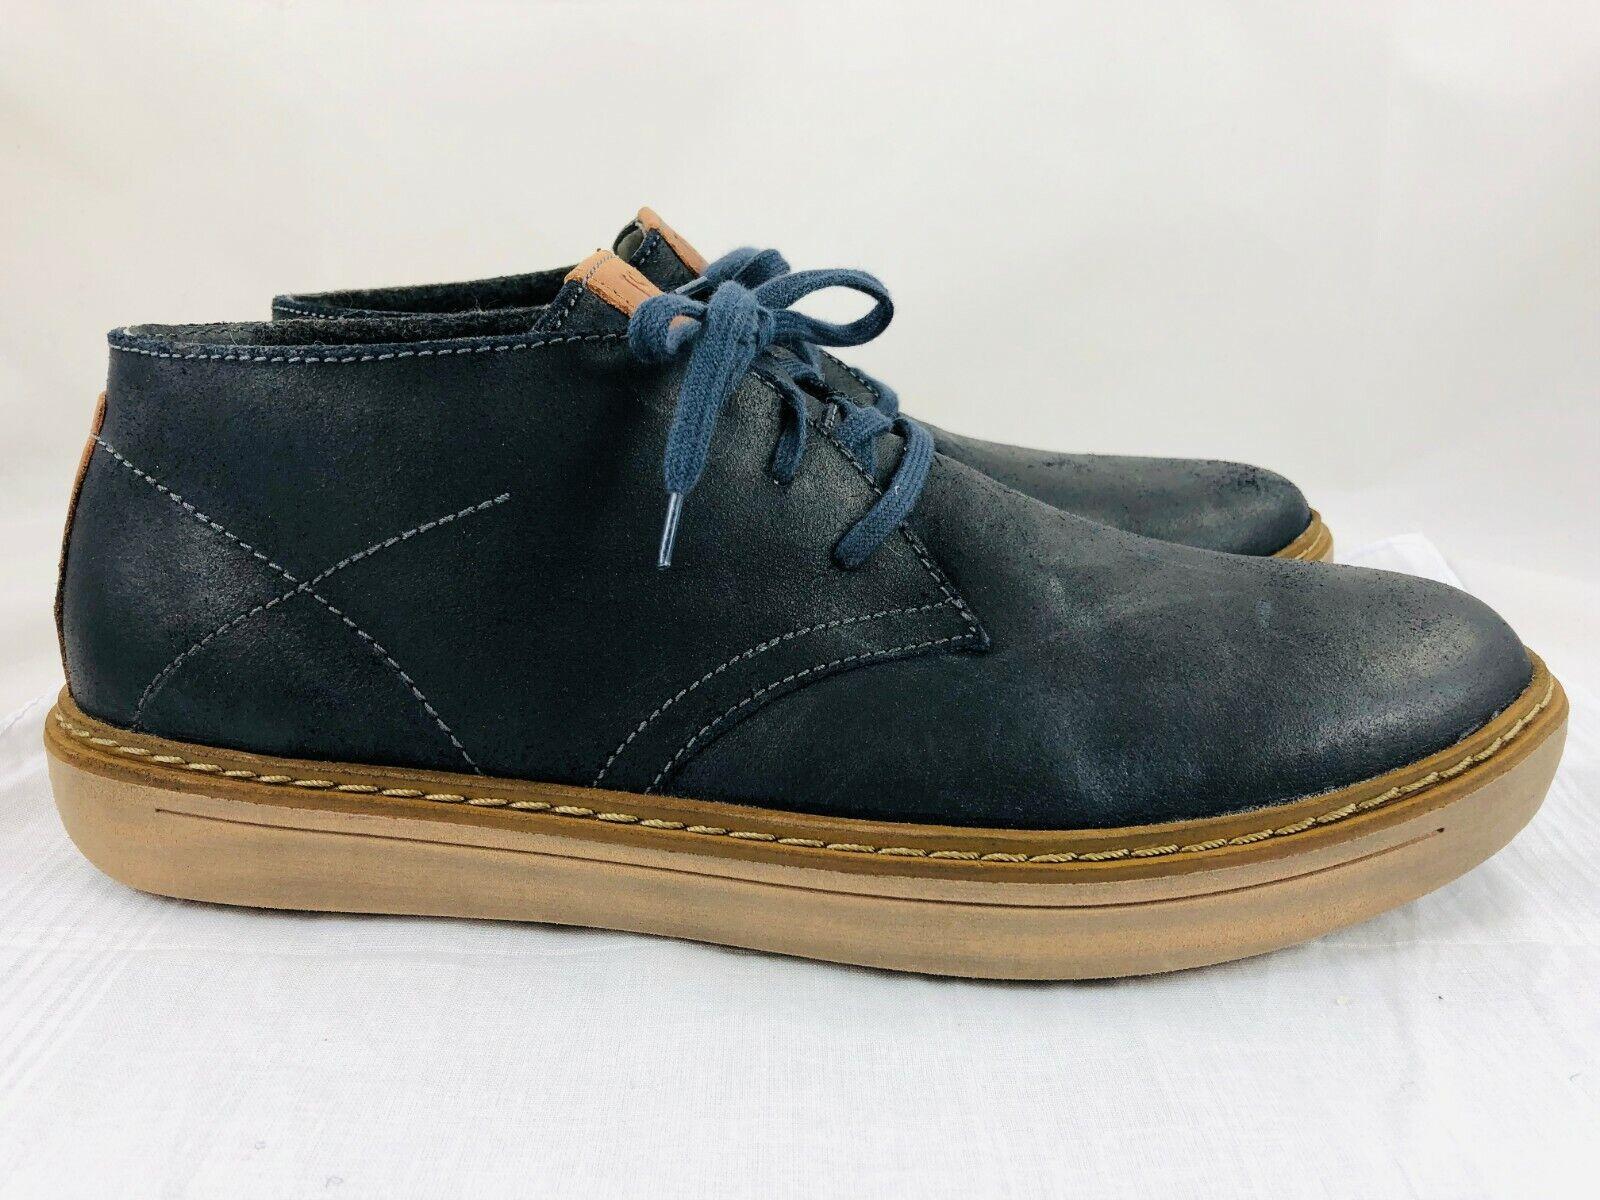 Josef Seibel Quentin 09 Men's 10-10.5 Navy bluee Leather Oxford Chukka Boot